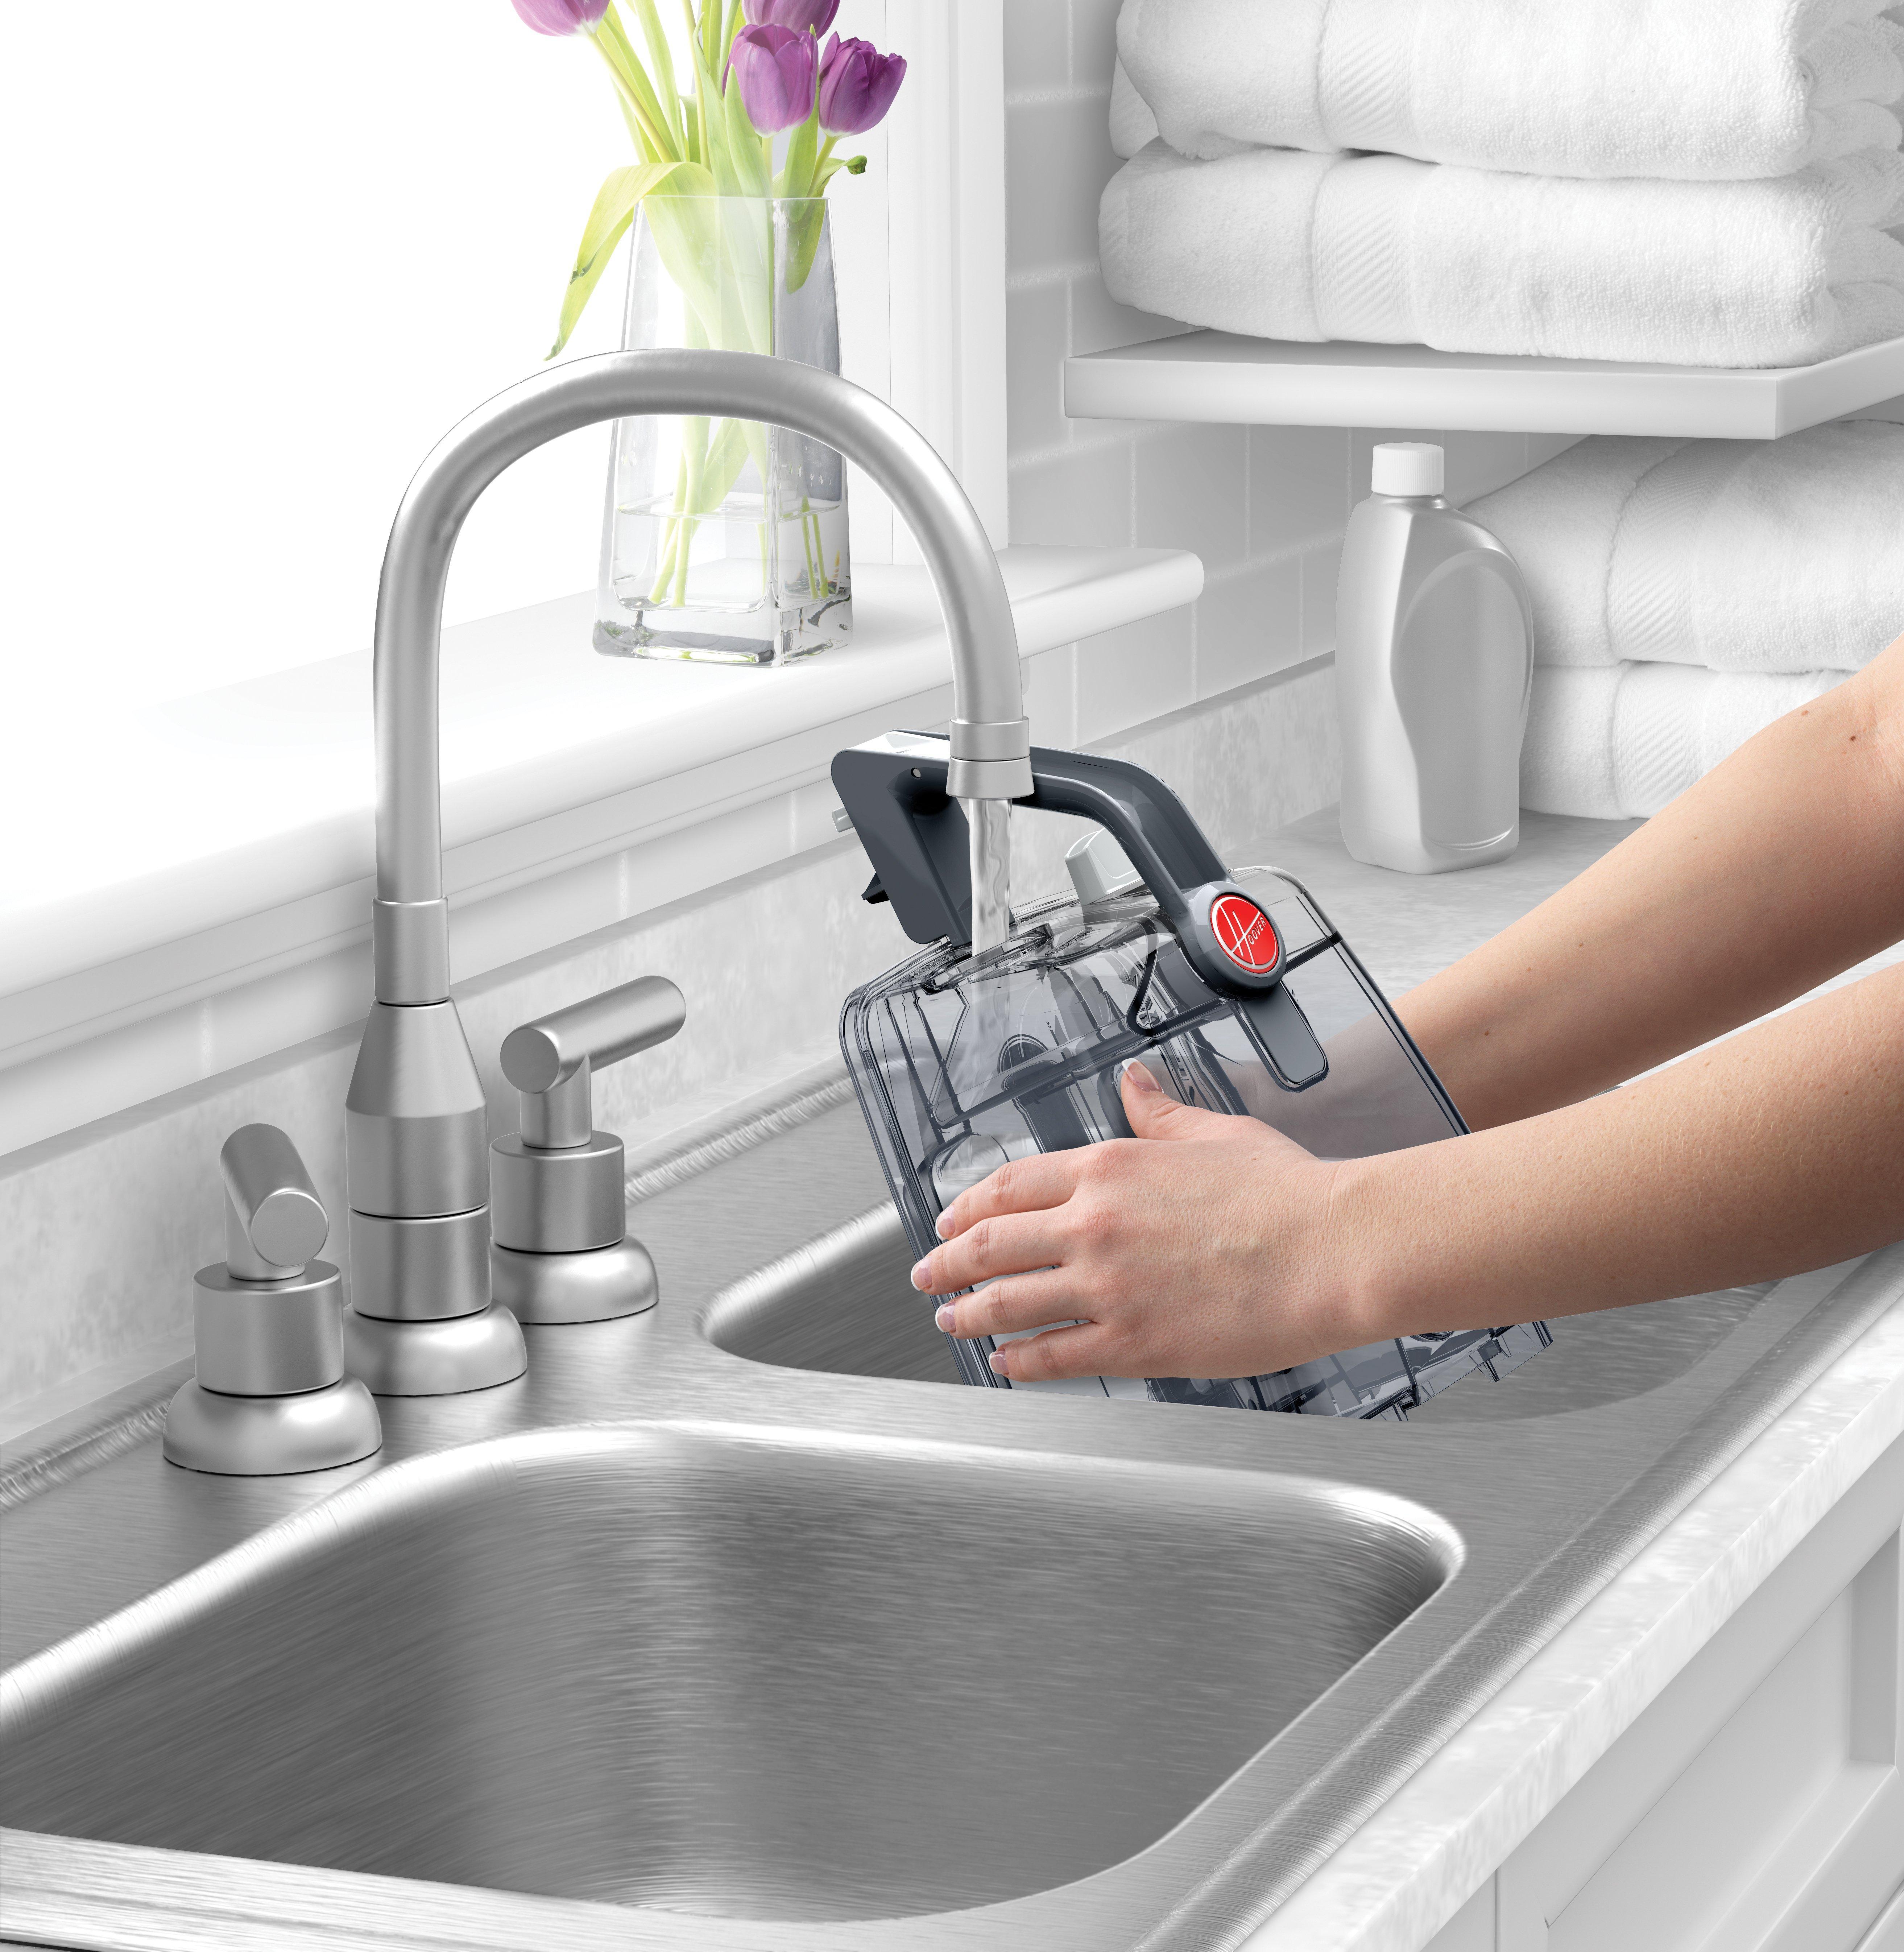 Hoover® Power Scrub Deluxe Carpet Cleaner8